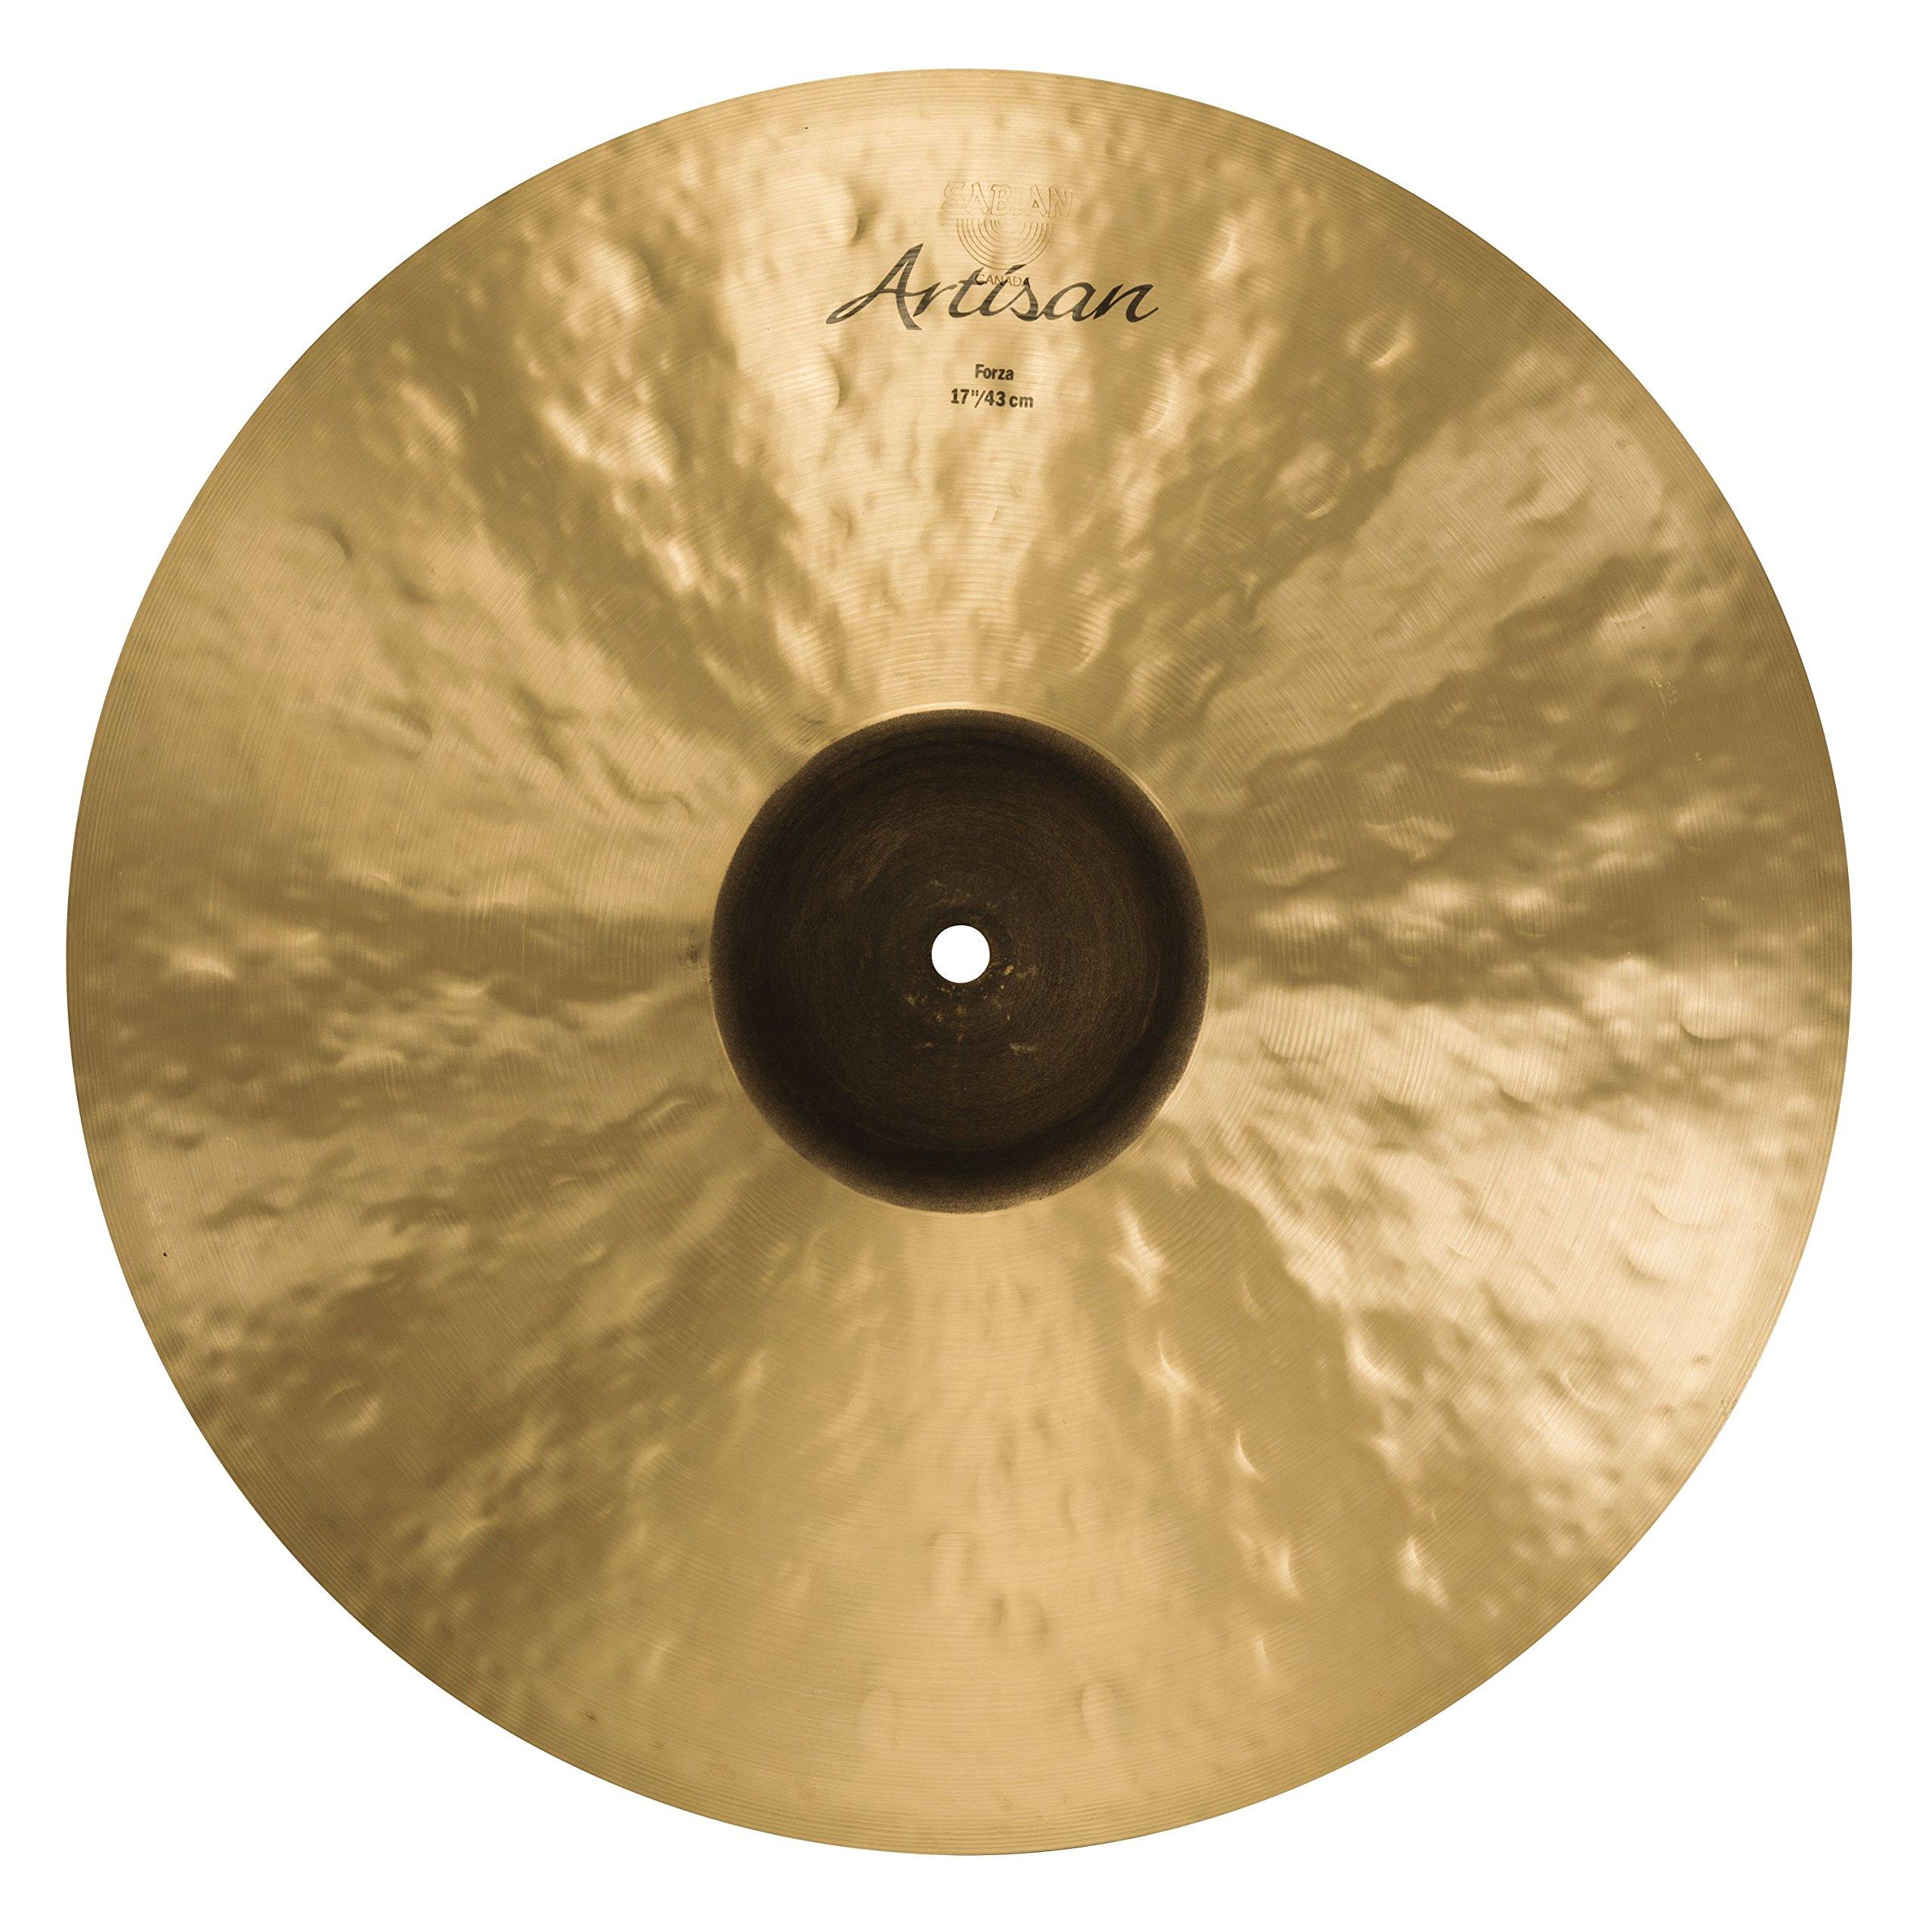 Sabian A1755F 17'' Artisan Forza Cymbal by Sabian (Image #1)